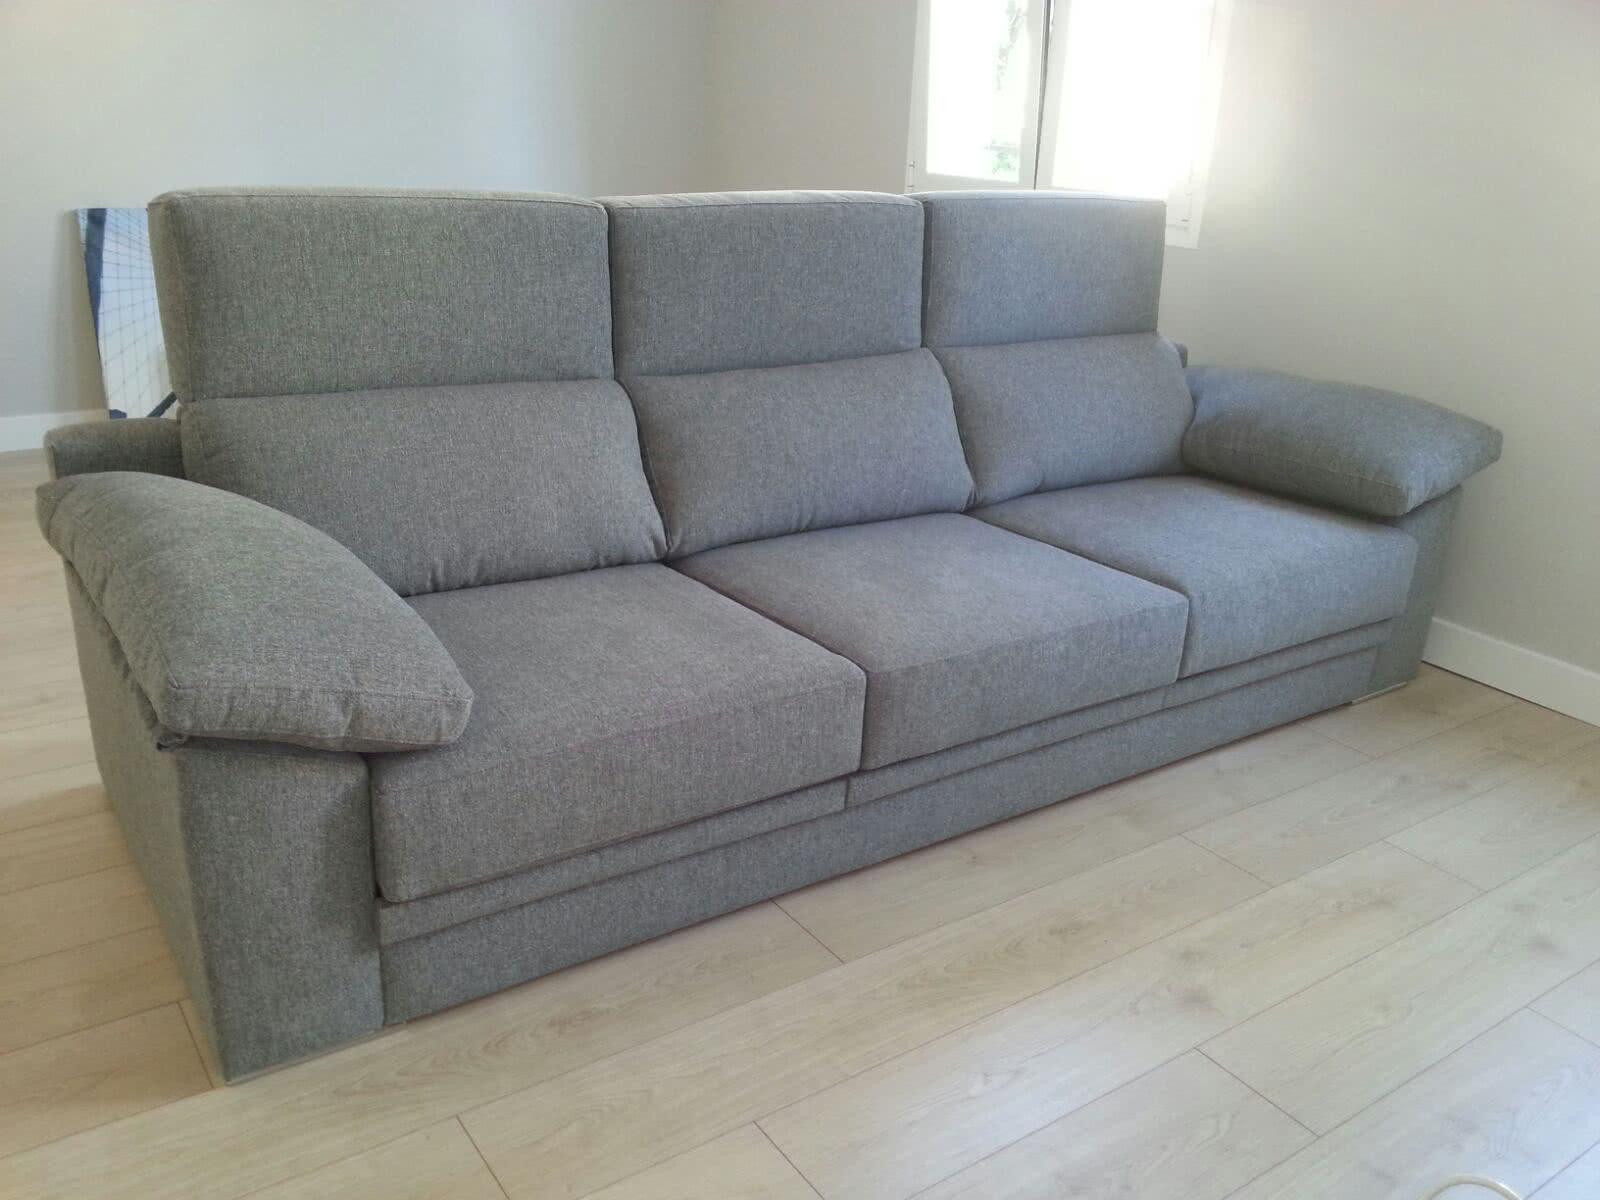 sofa modernos 2017 sofas seattle washington sofá modelo reclinable brazo almohadilla  masabo